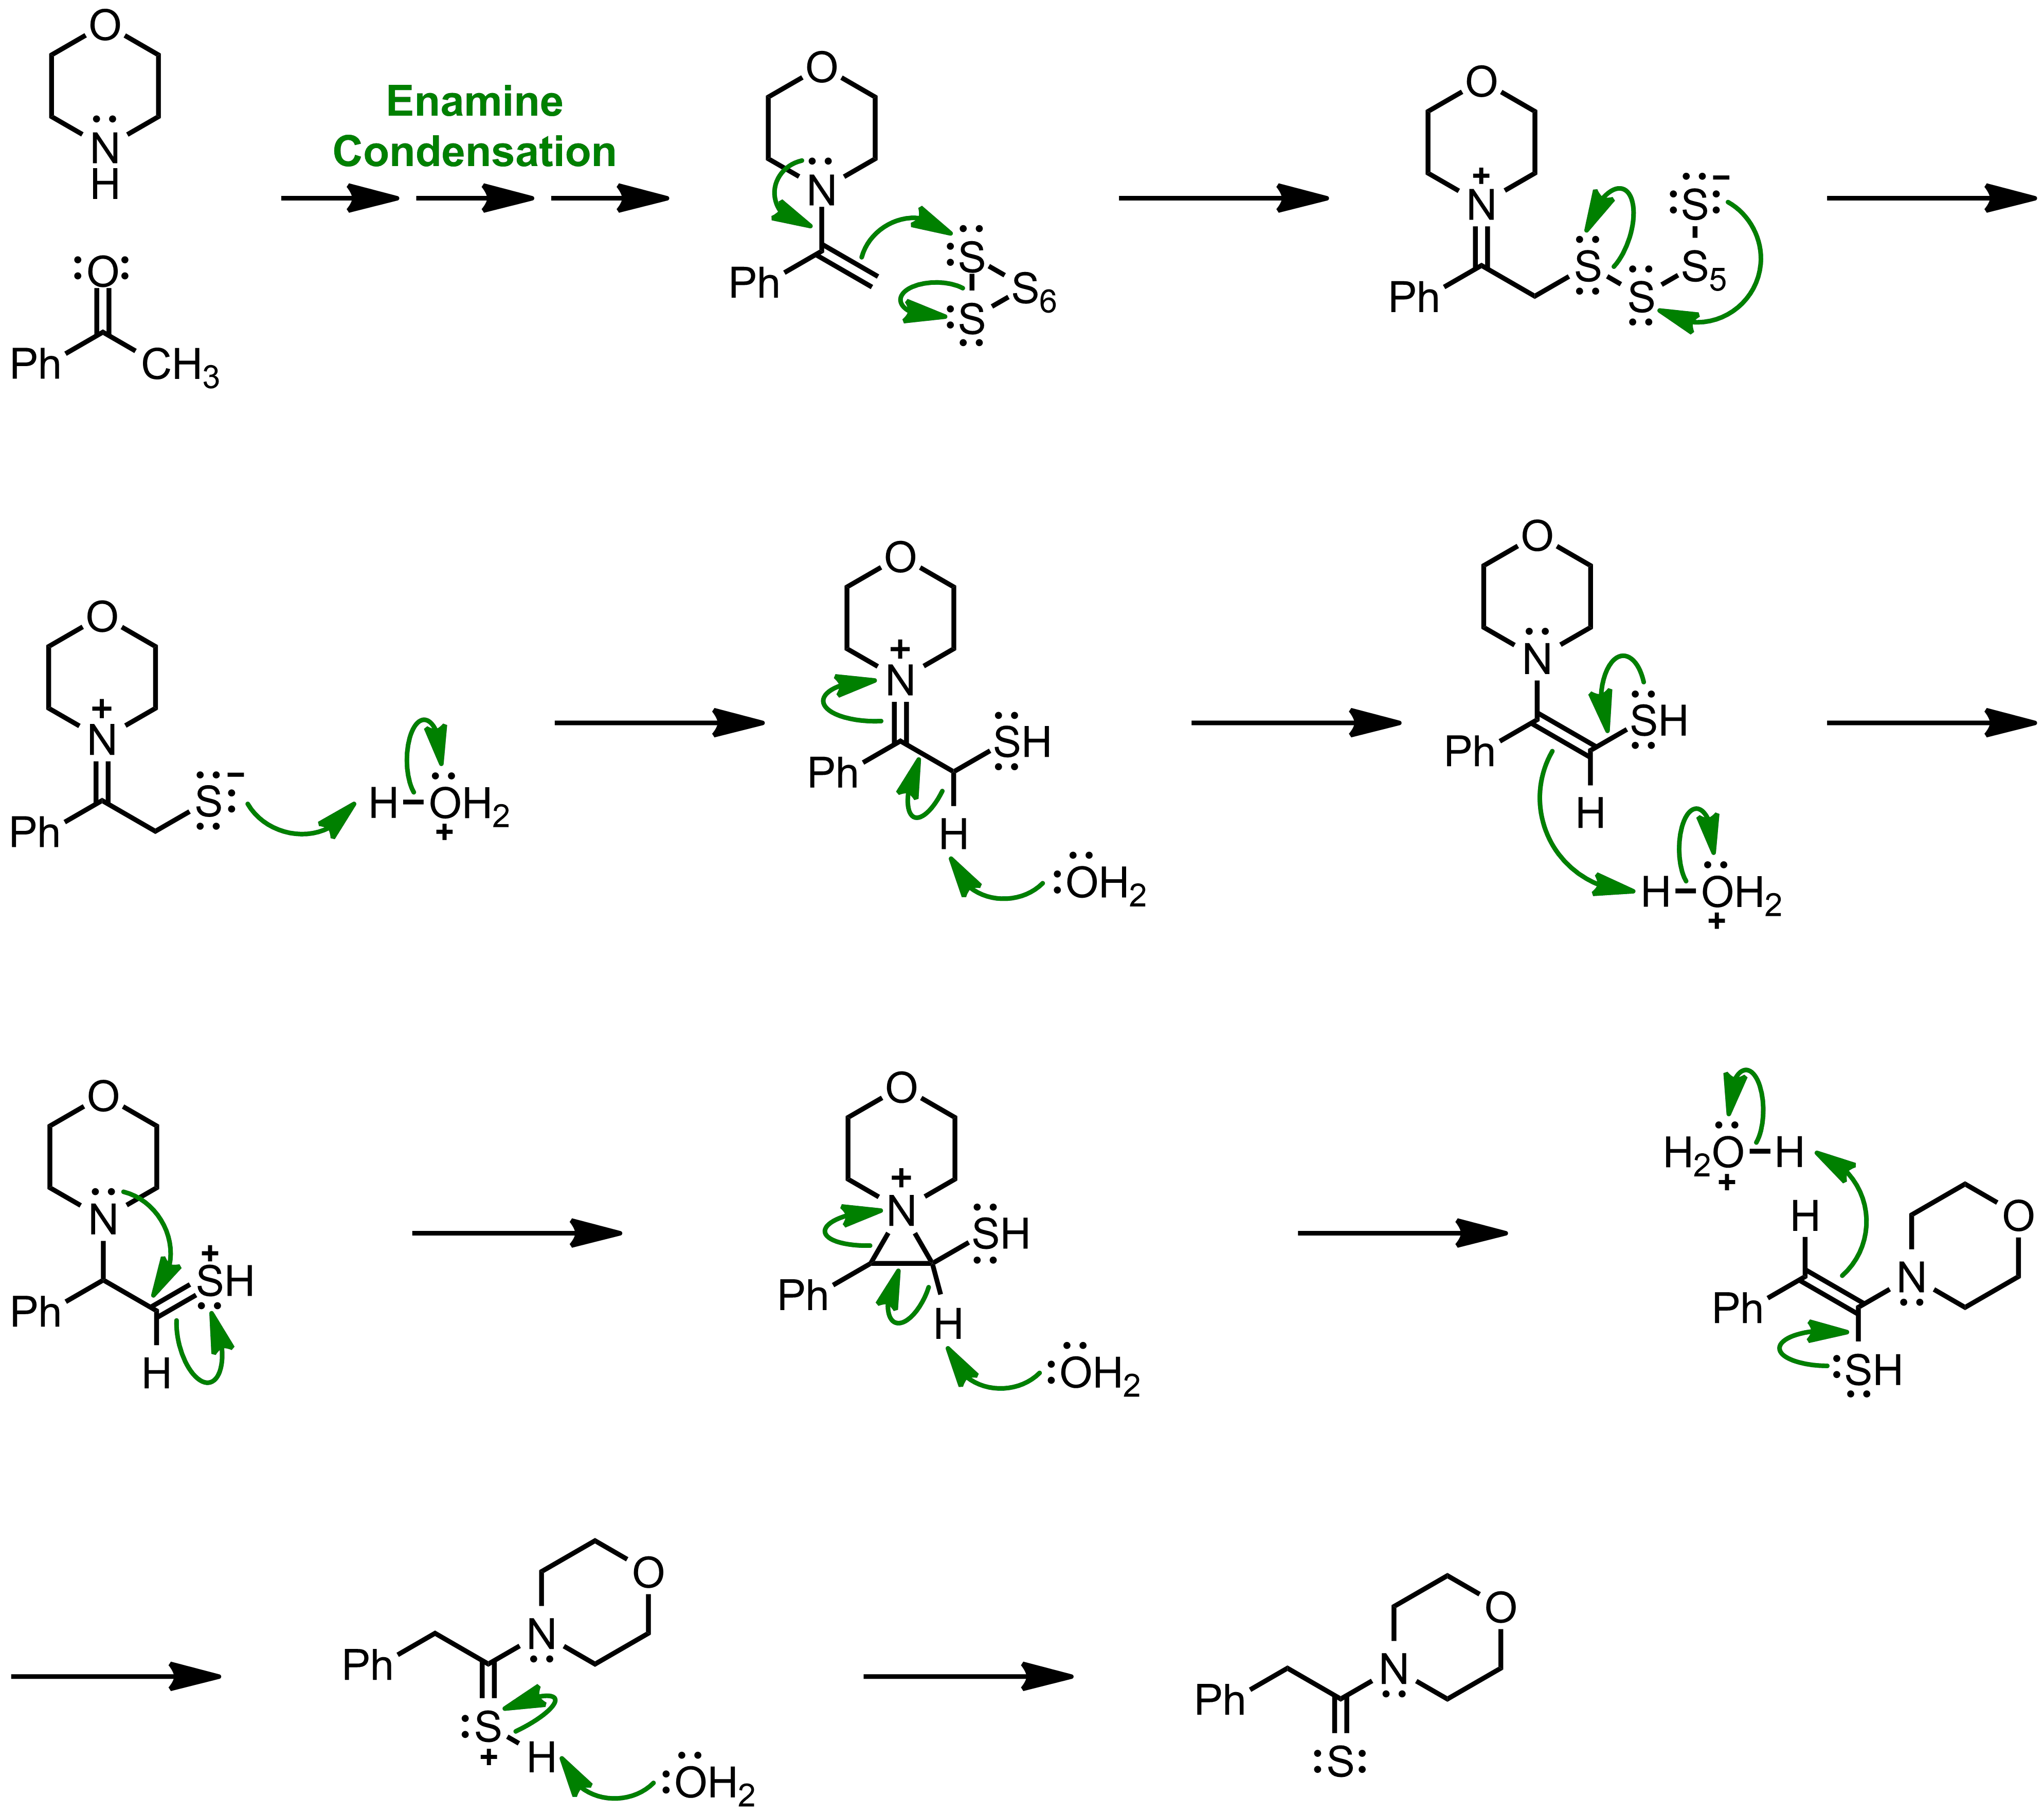 Mechanism of the Willgerodt-Kindler Reaction